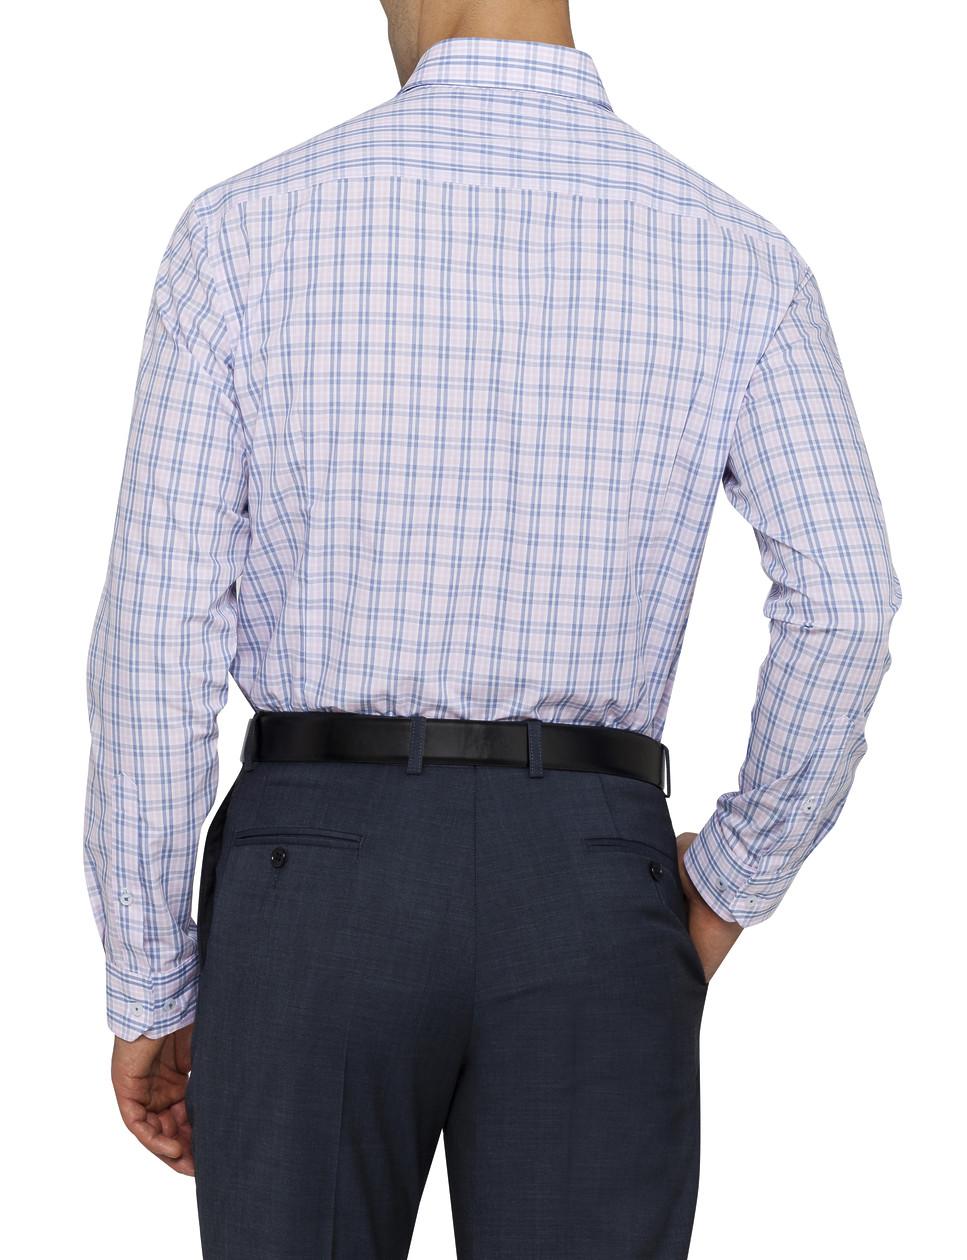 Mens Slim Fit Shirt Pink Check Van Heusen Business